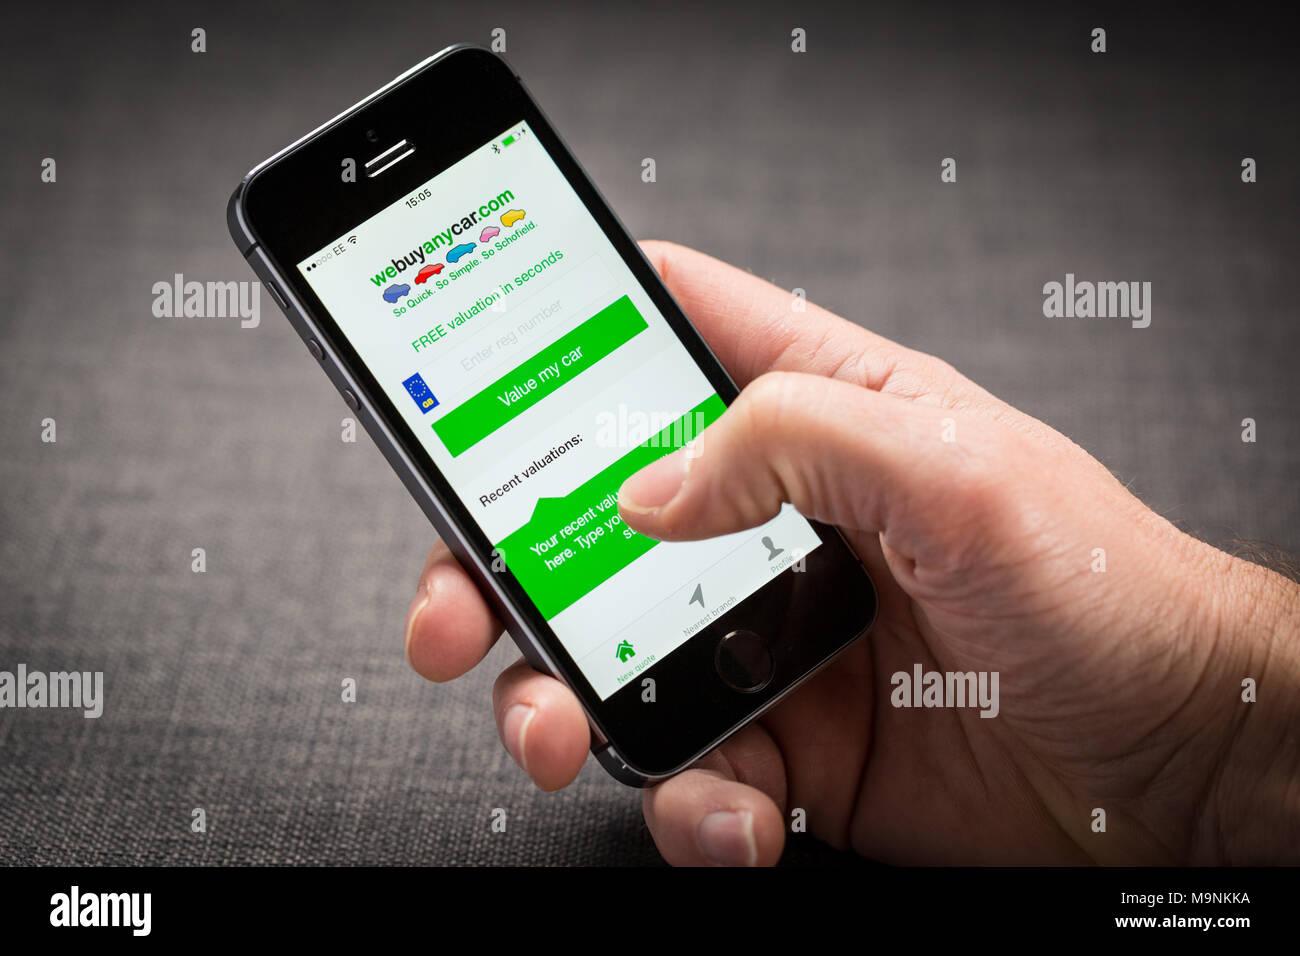 webuyanycar.com app on an iPhone - Stock Image